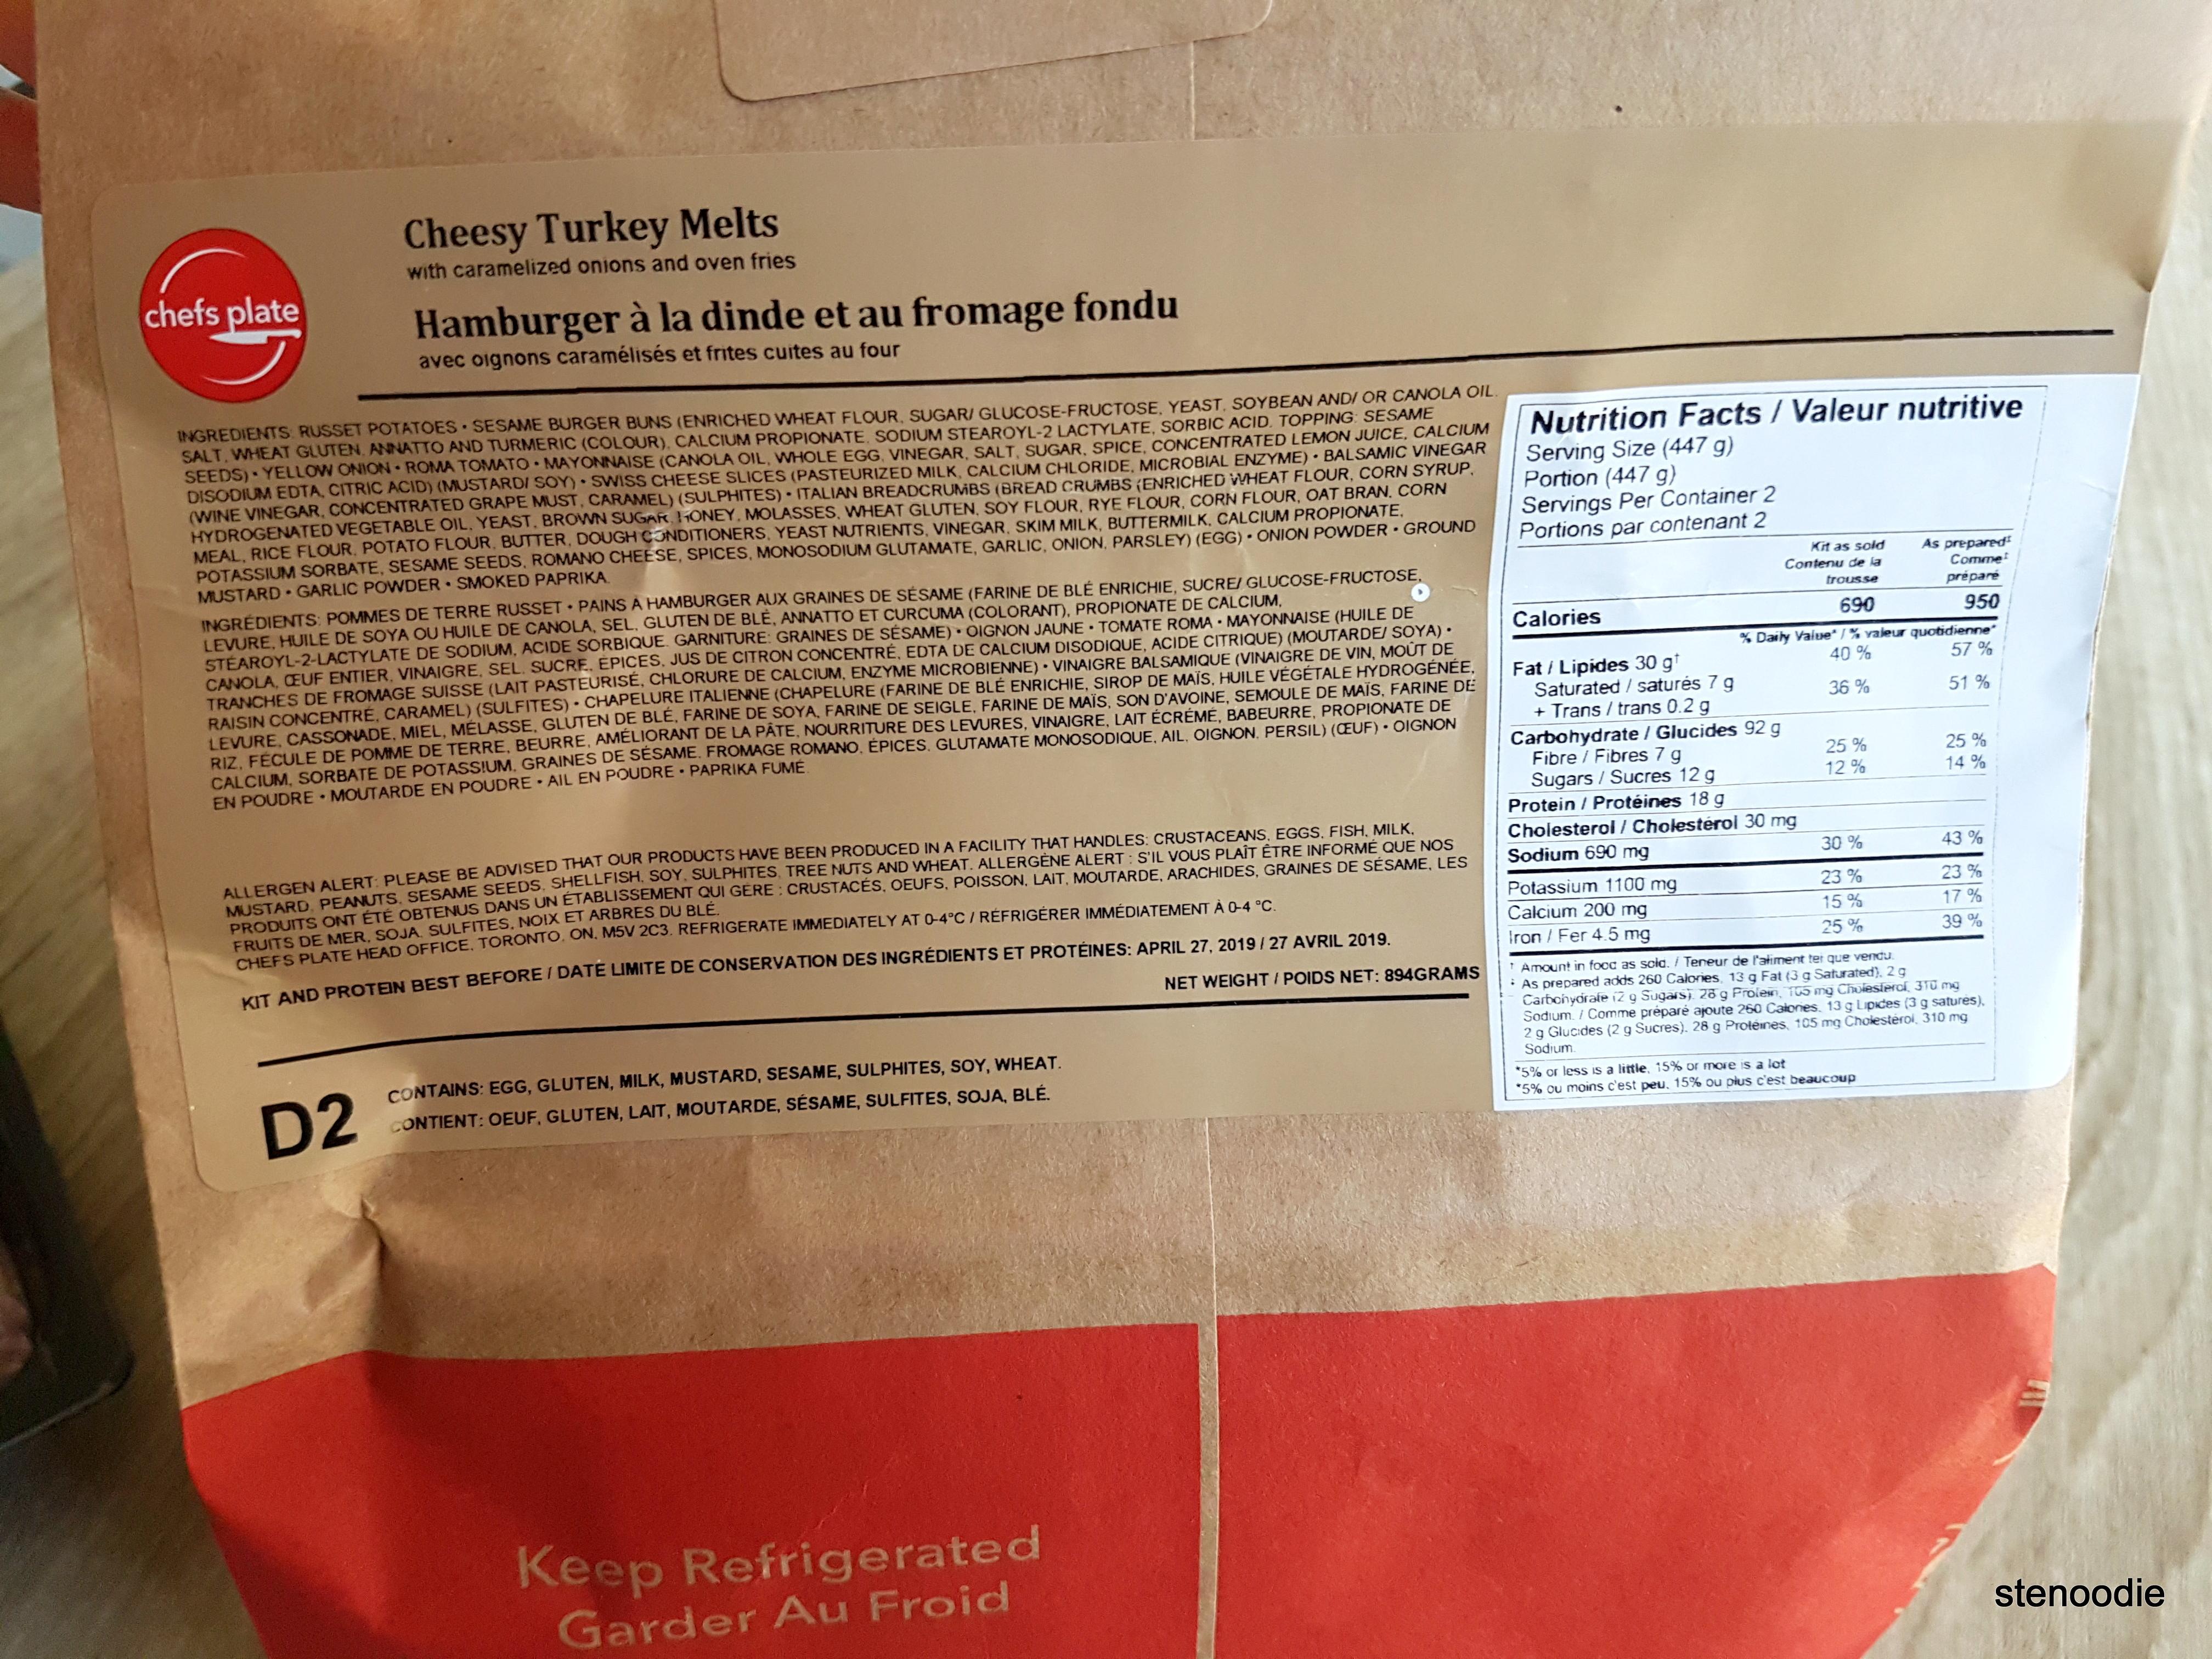 Cheesy Turkey Melts nutrition information